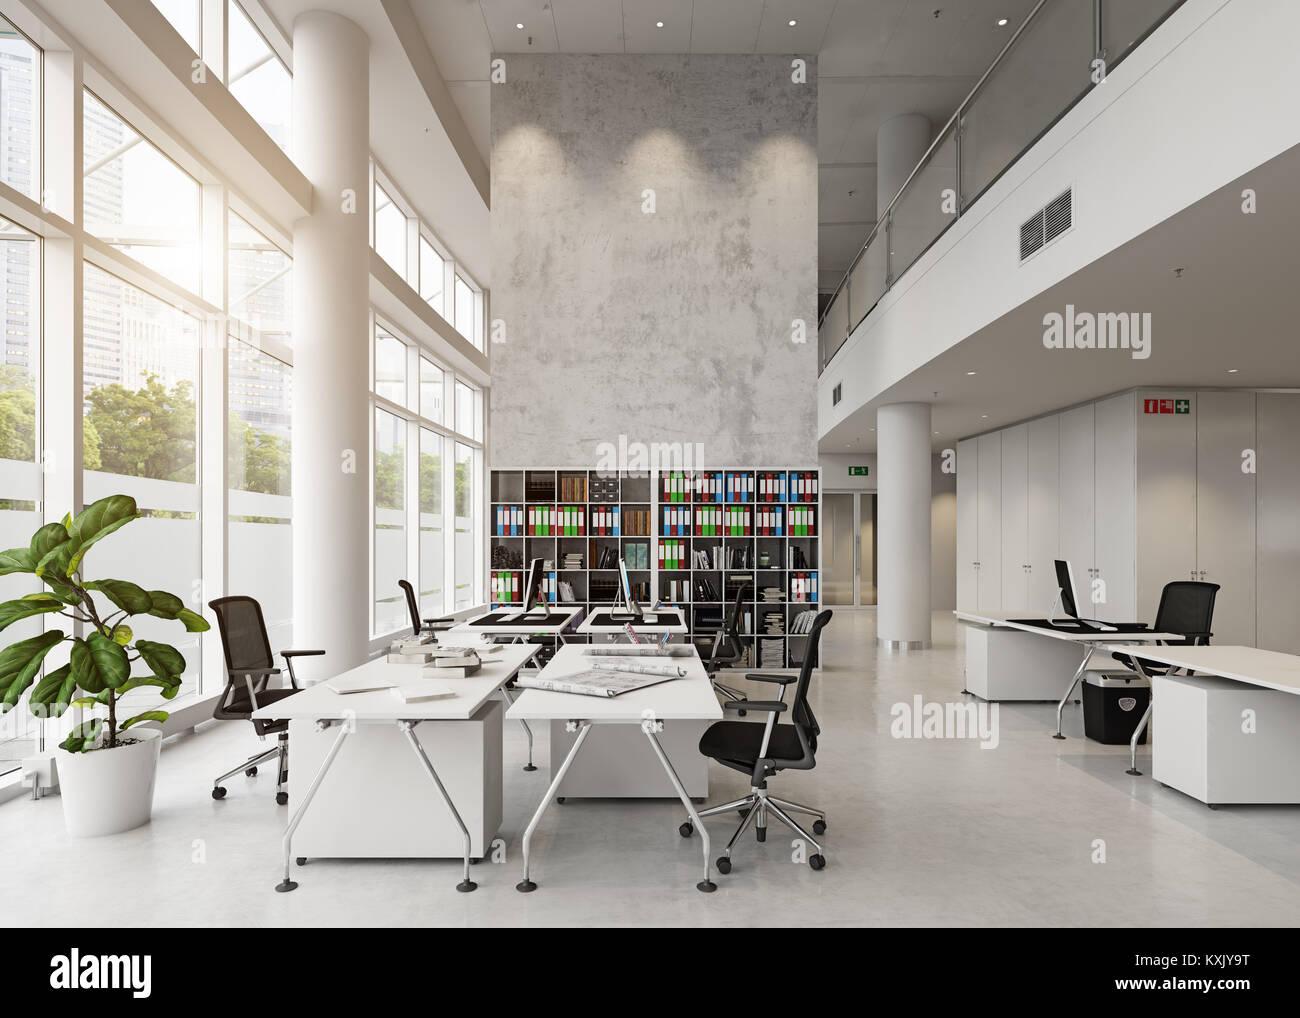 Modernes Bürogebäude Interieur. 3D-rendering Konzept Stockbild